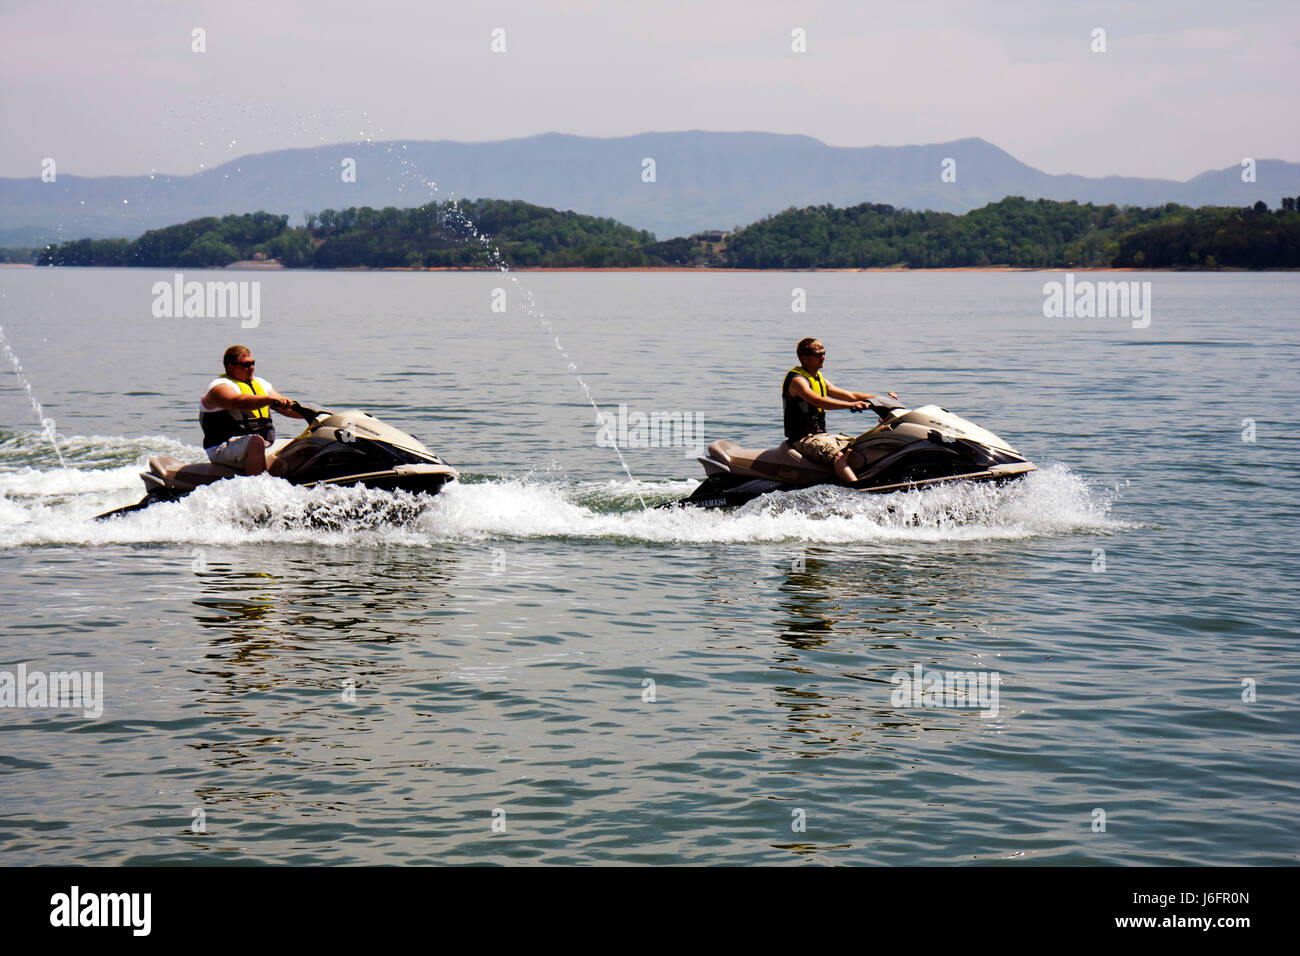 Tennessee Sevierville Douglas Lake jet ski wave runner water sport - Stock Image